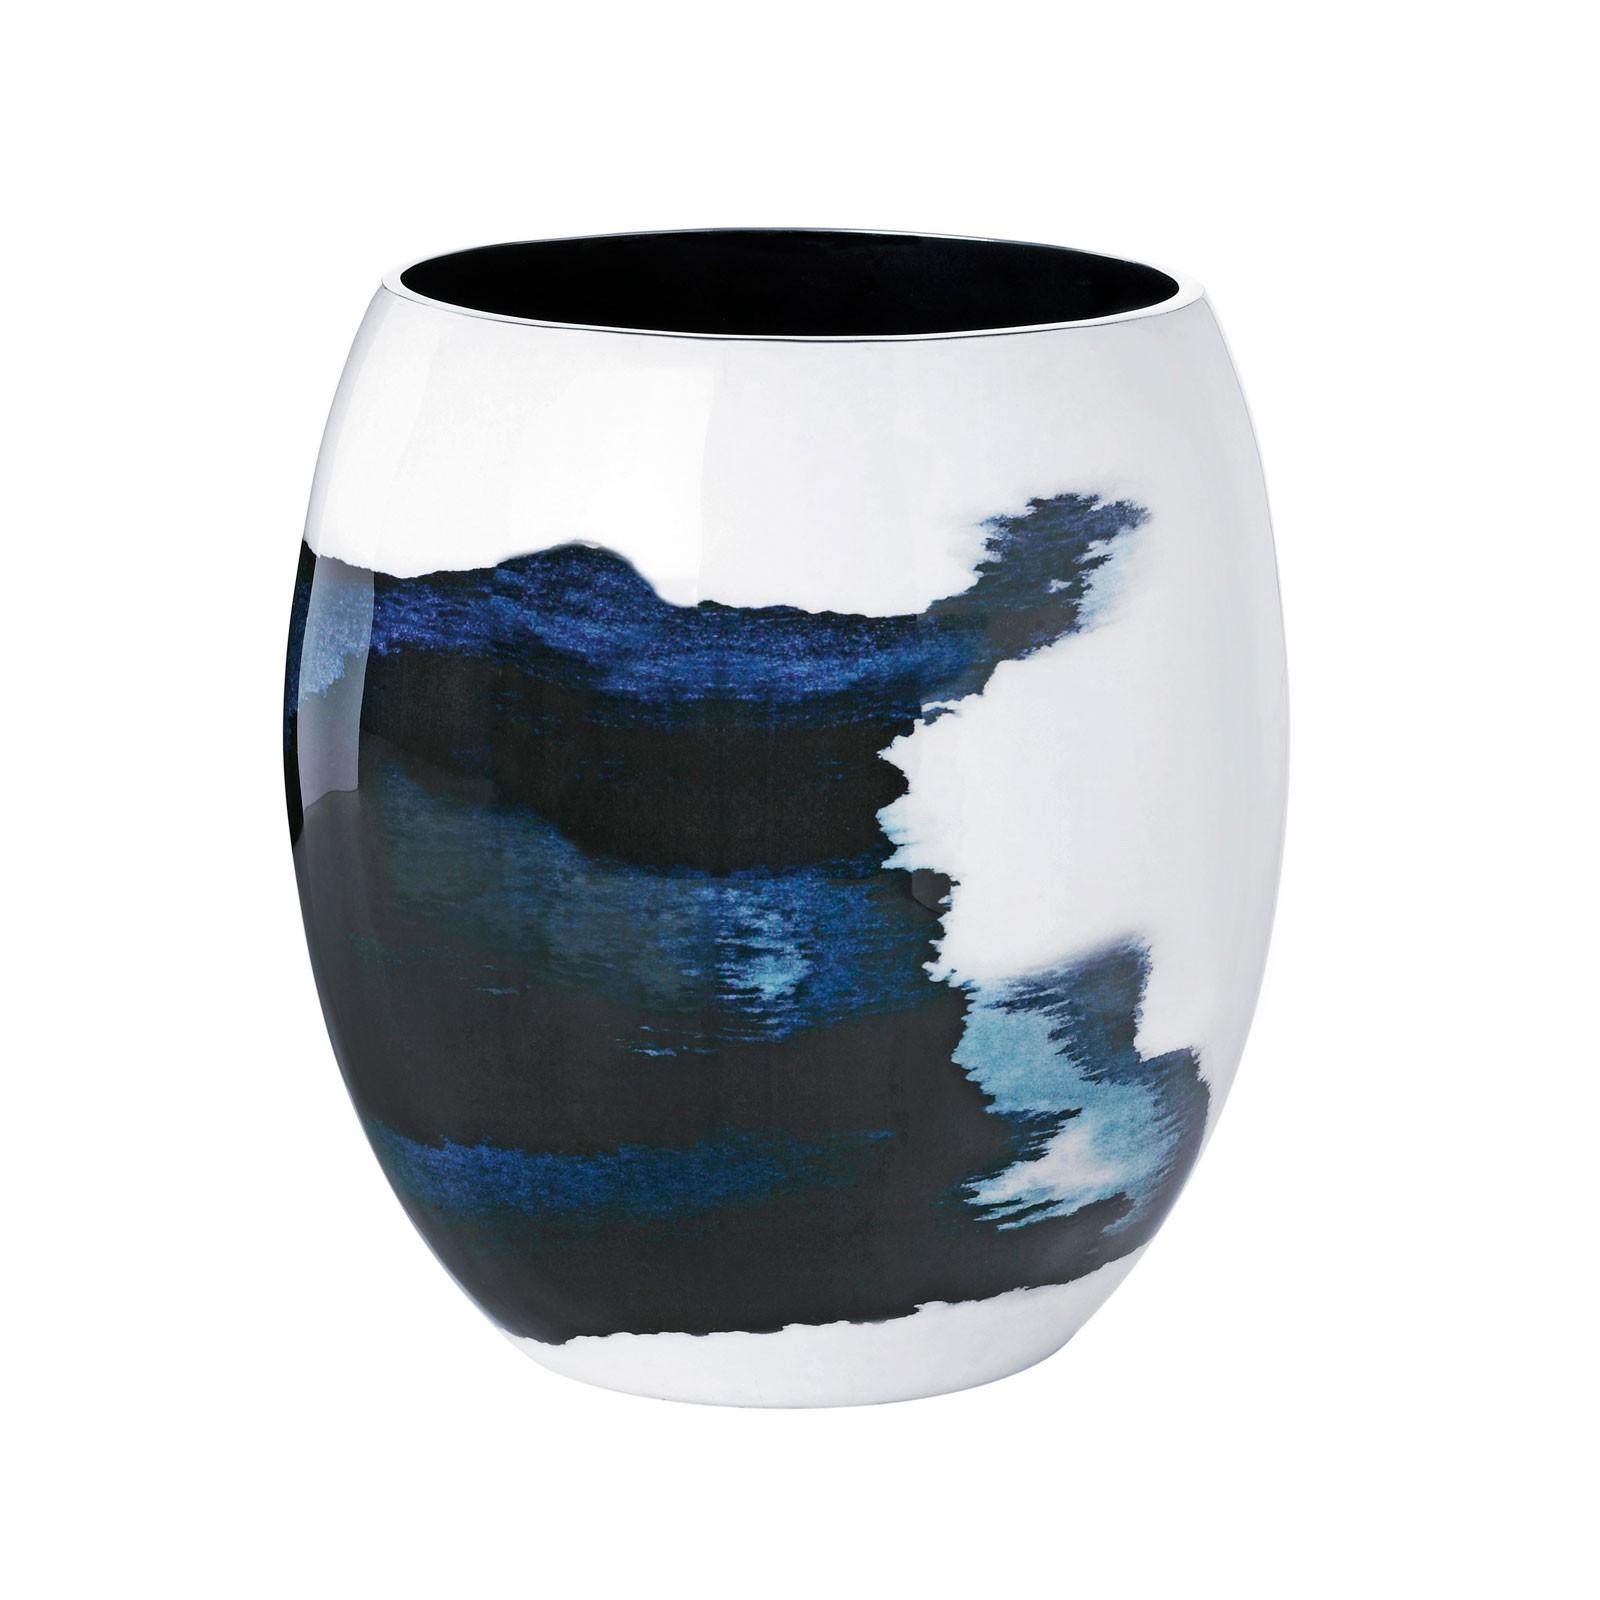 stelton Stockholm Vase mittel Ø 16,6 cm AQUATIC